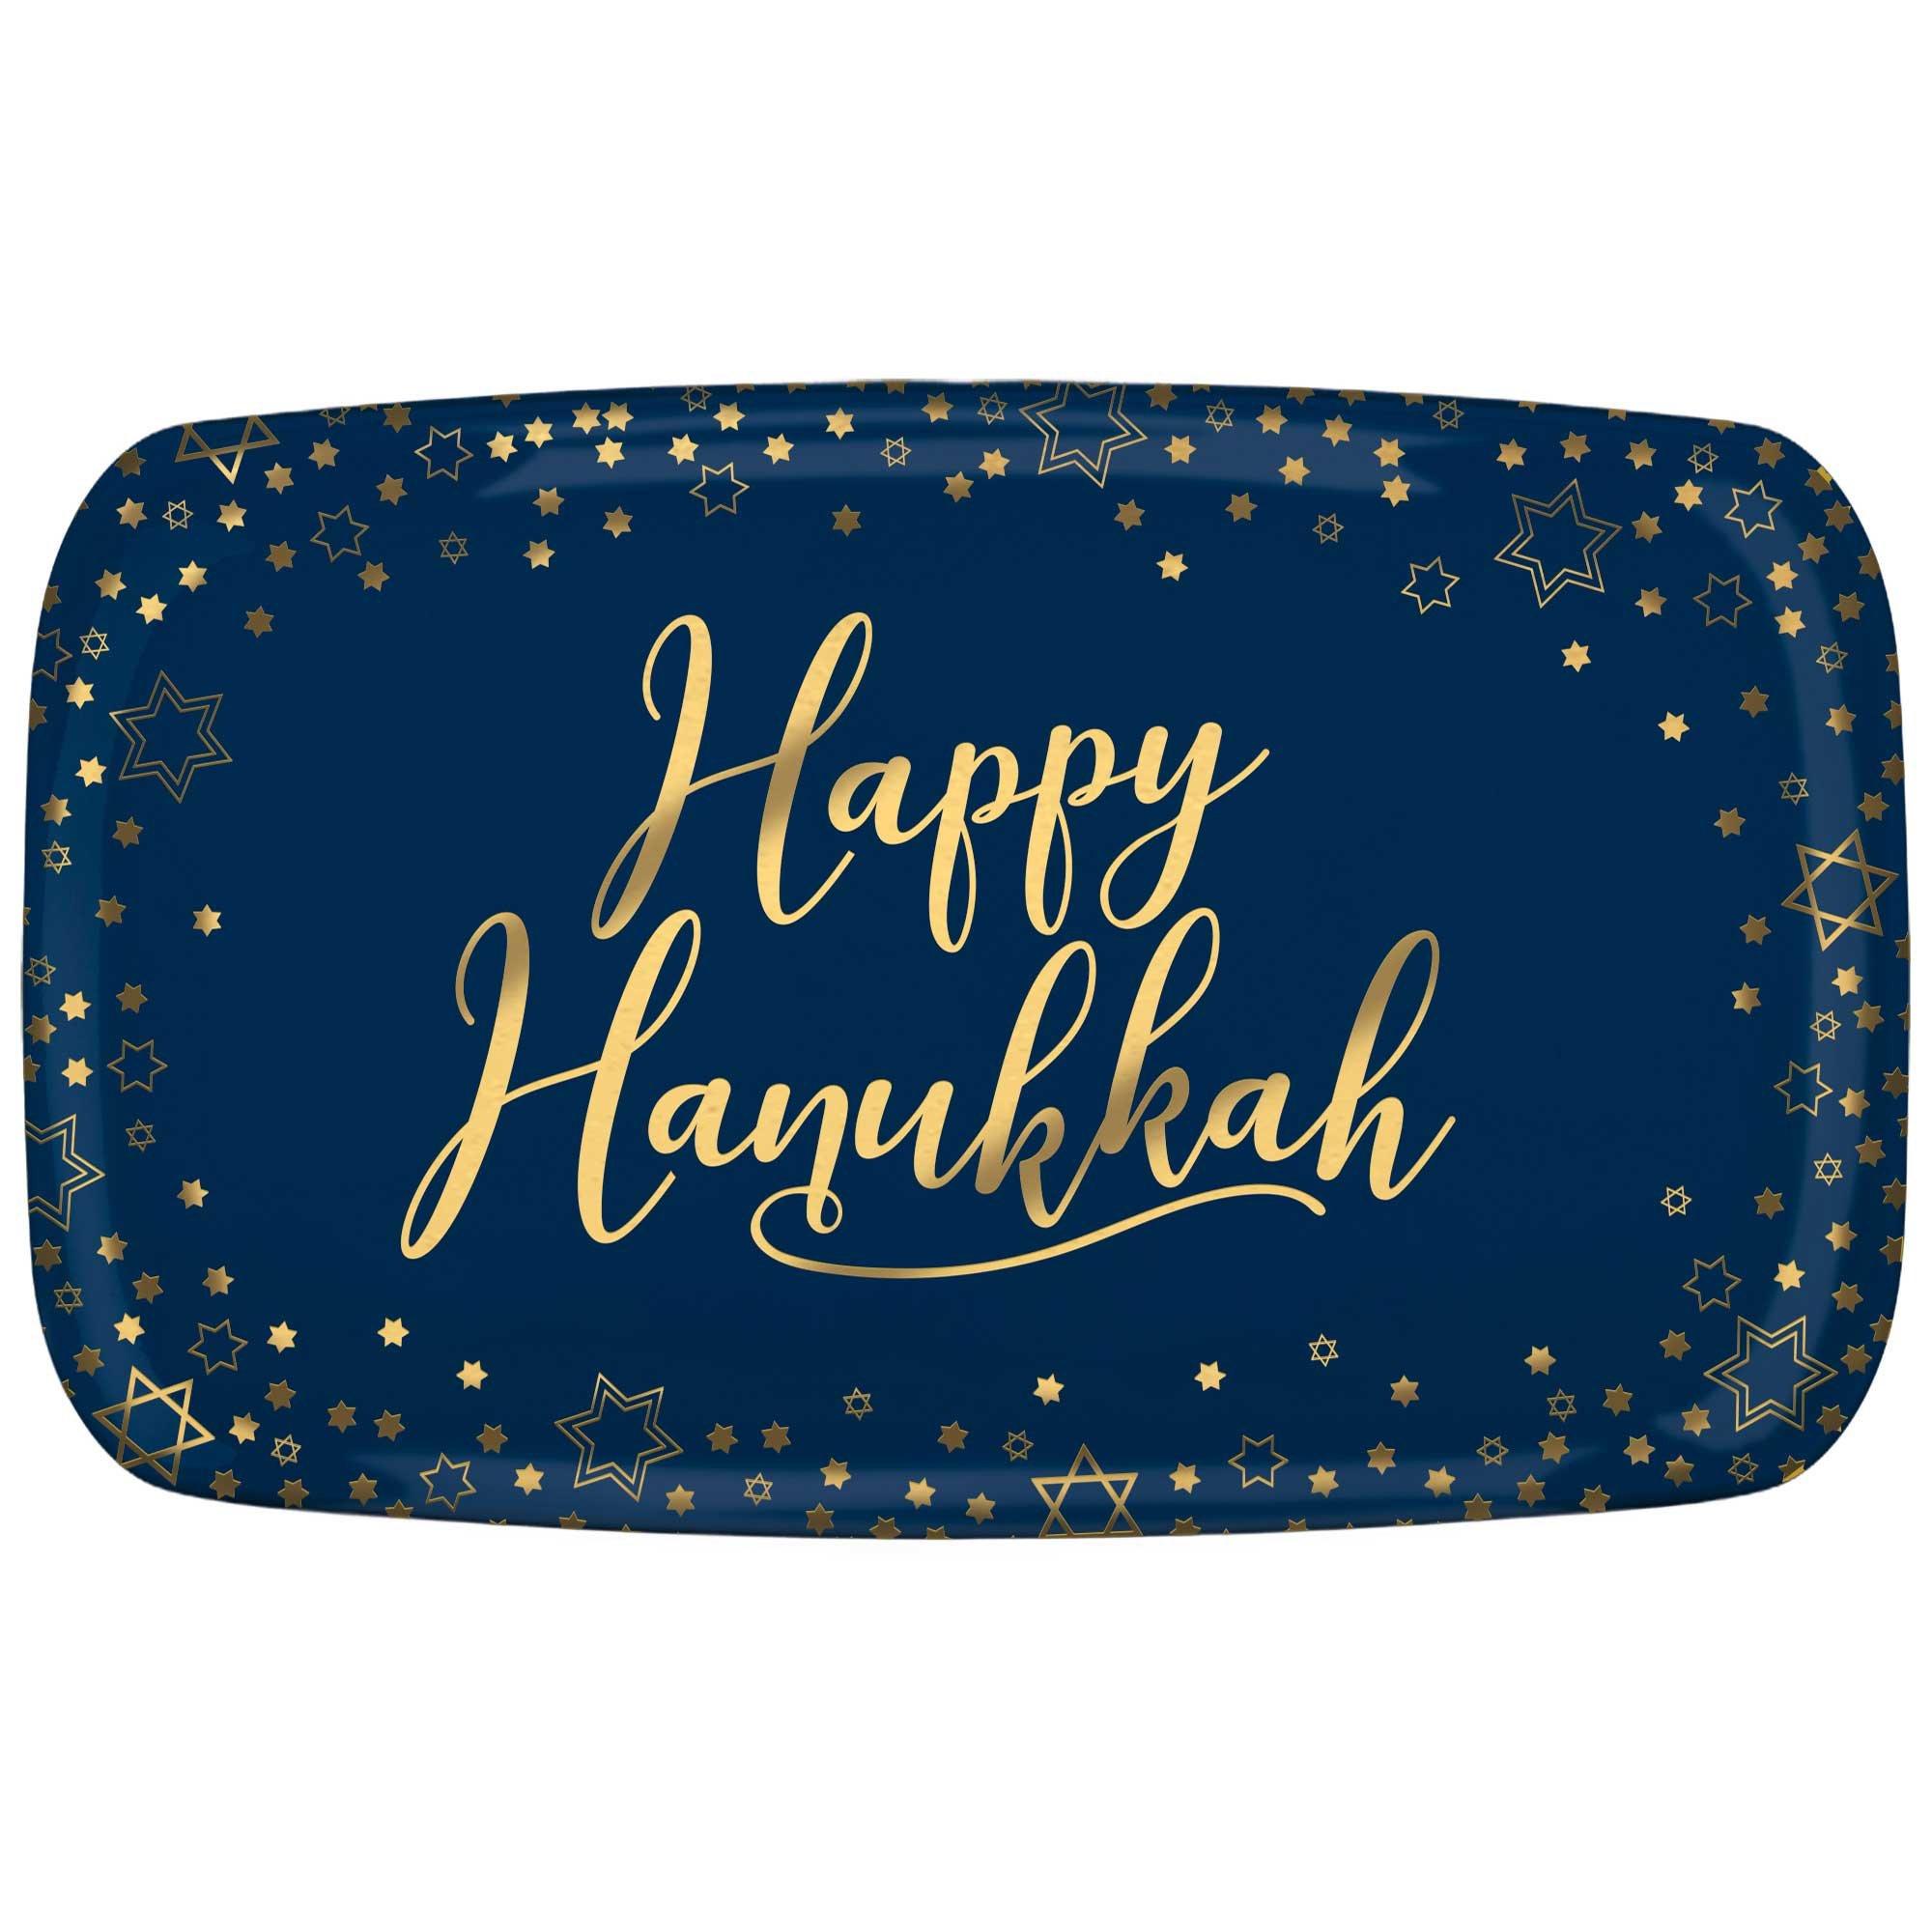 Hanukkah Rectangular Plastic Platter Hot Stamped